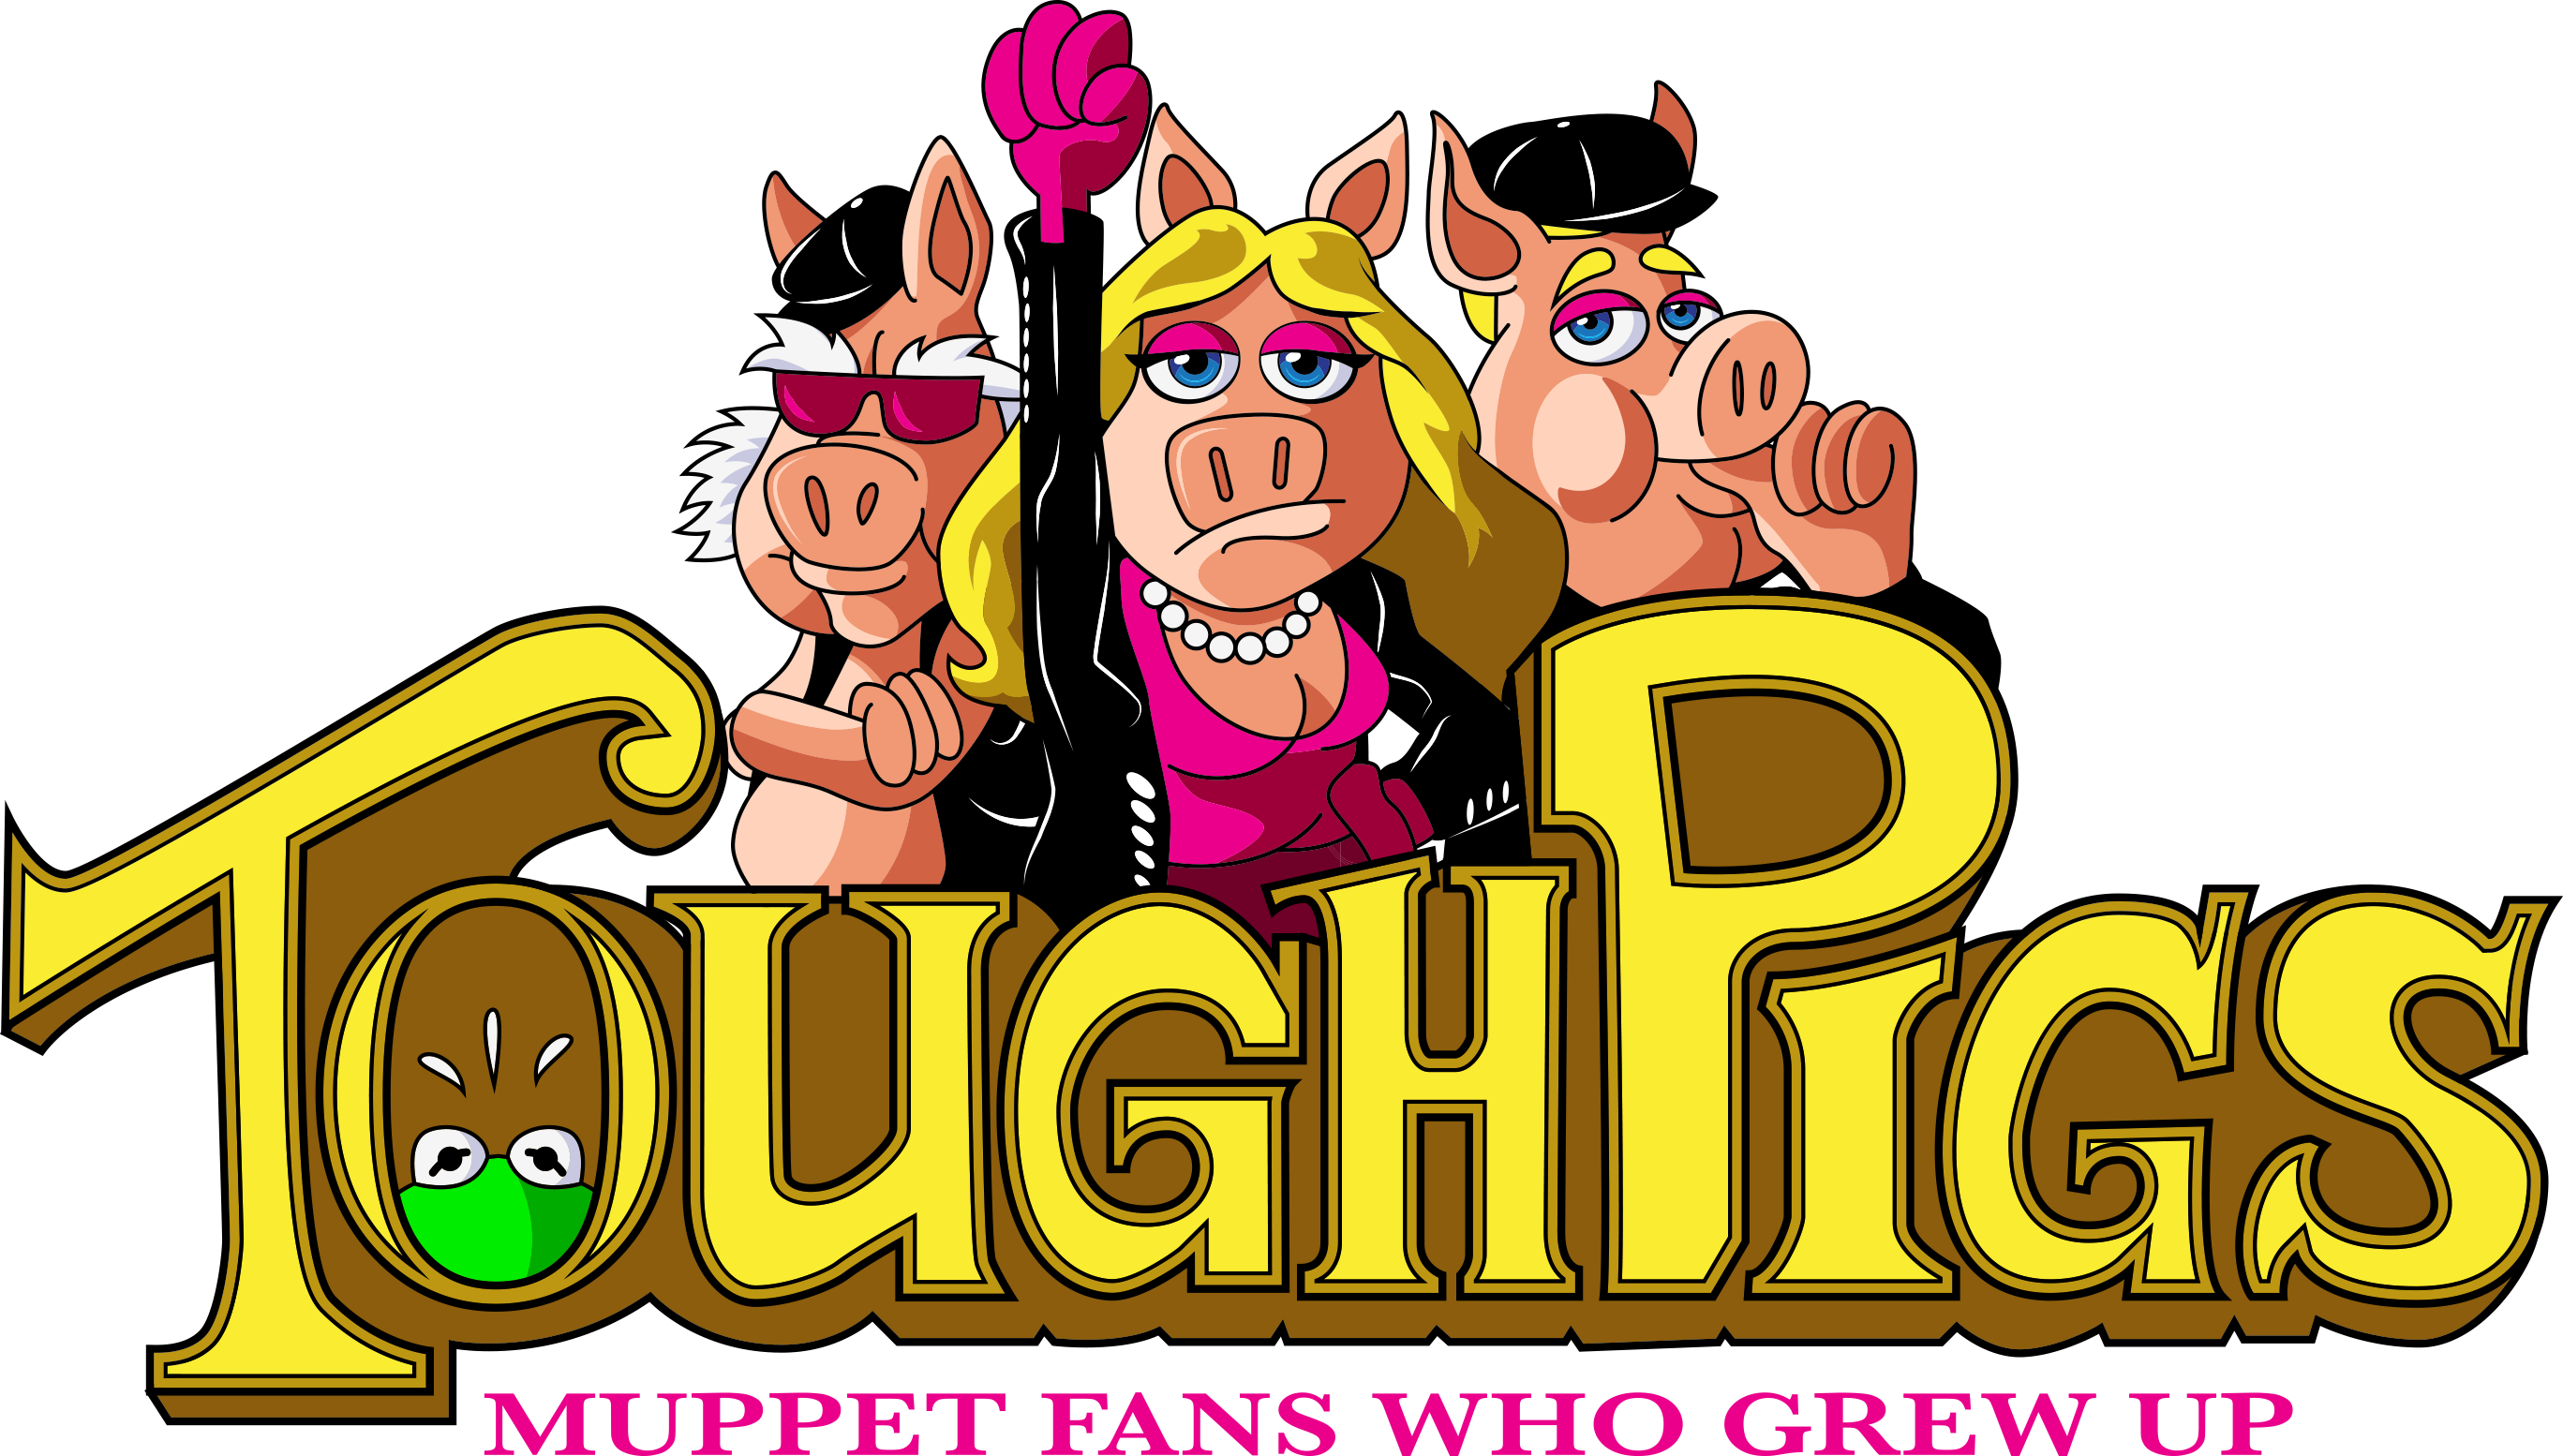 File:Toughpigs logo.png